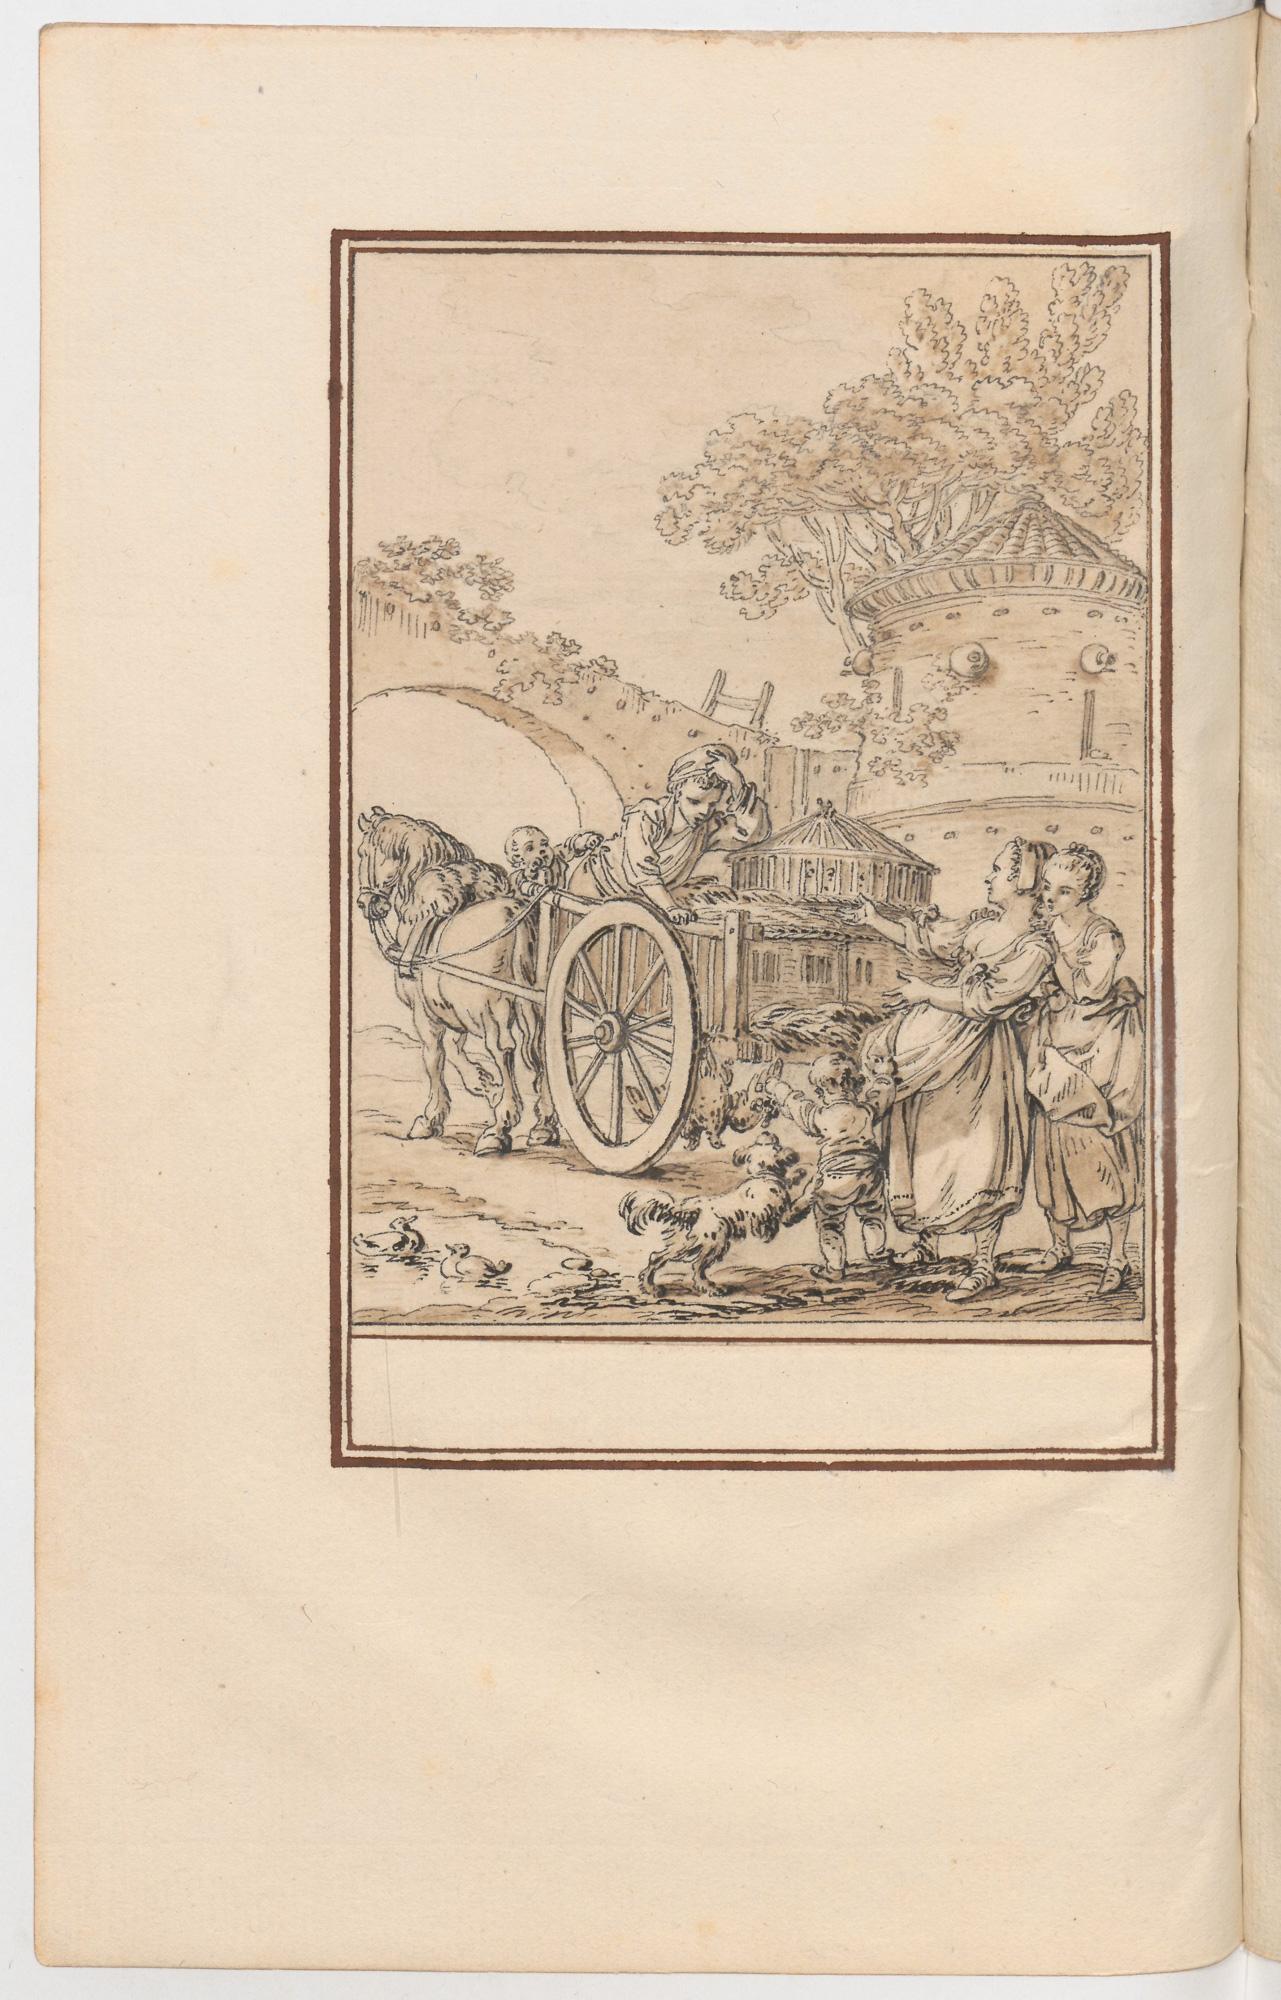 S.4.12 Dame françoise, Chantilly, Image